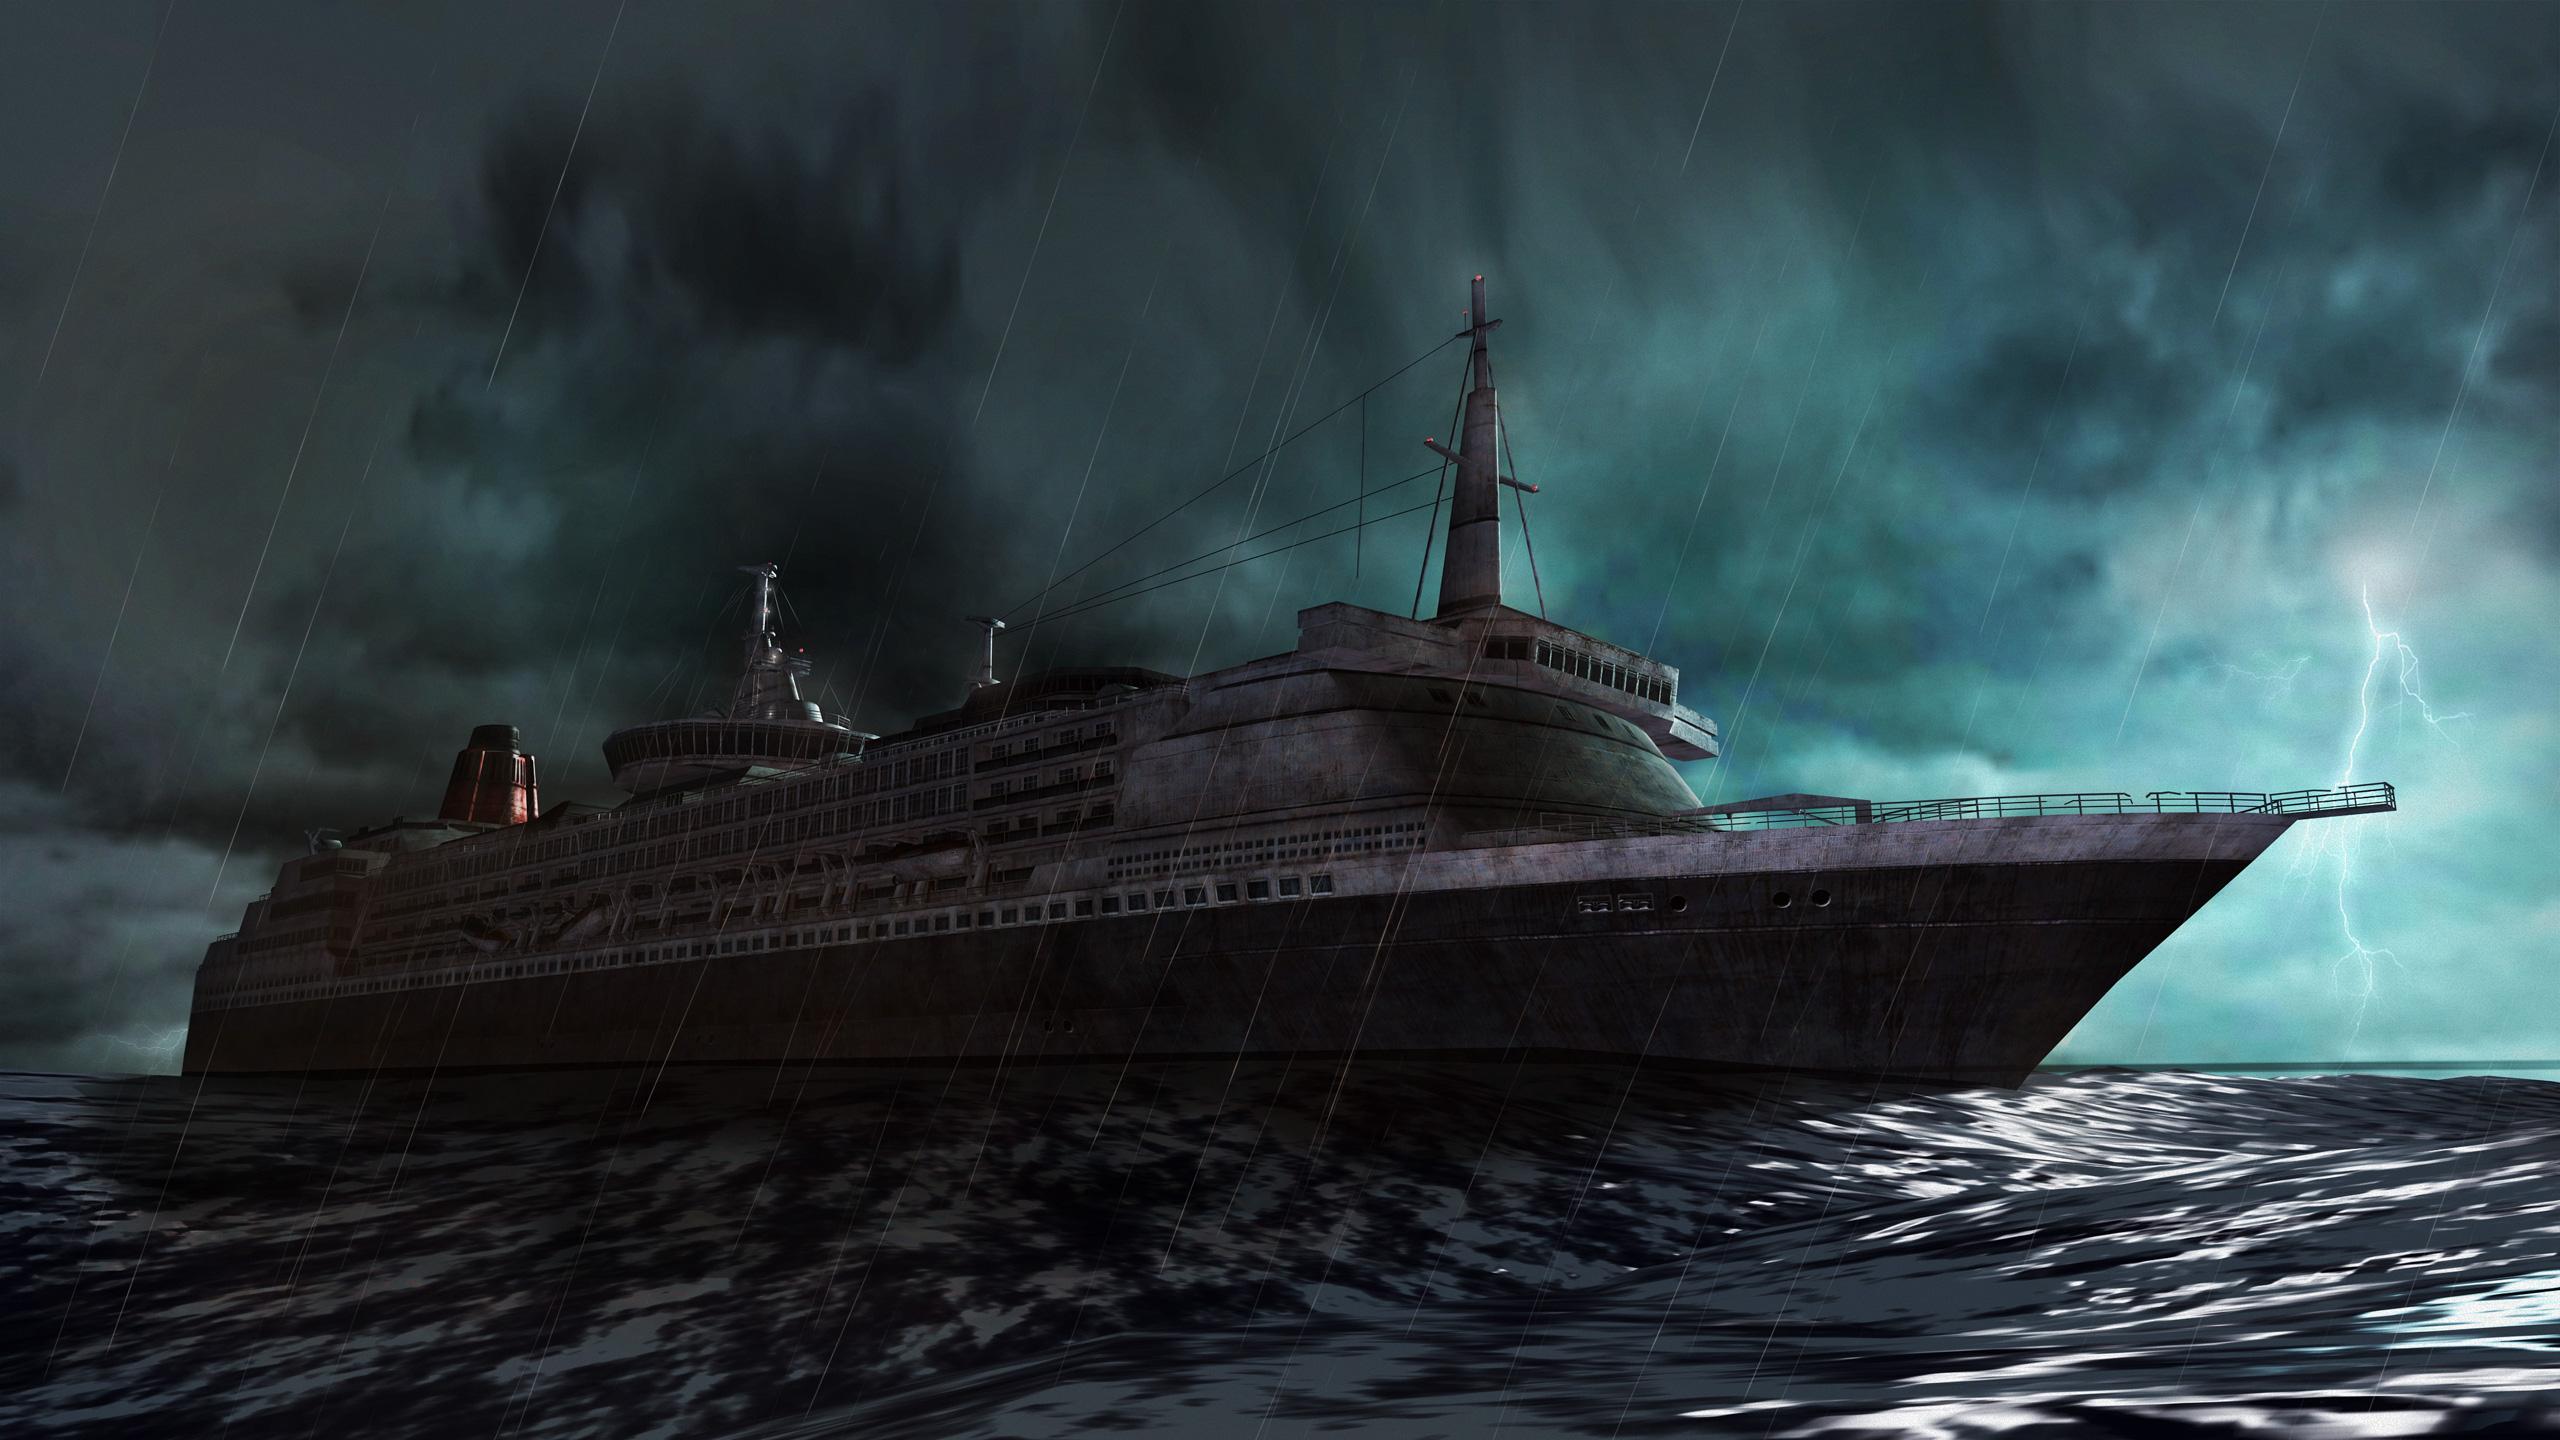 Queen Zenobia Resident Evil Wiki FANDOM Powered By Wikia - Queen elizabeth cruise ship wikipedia